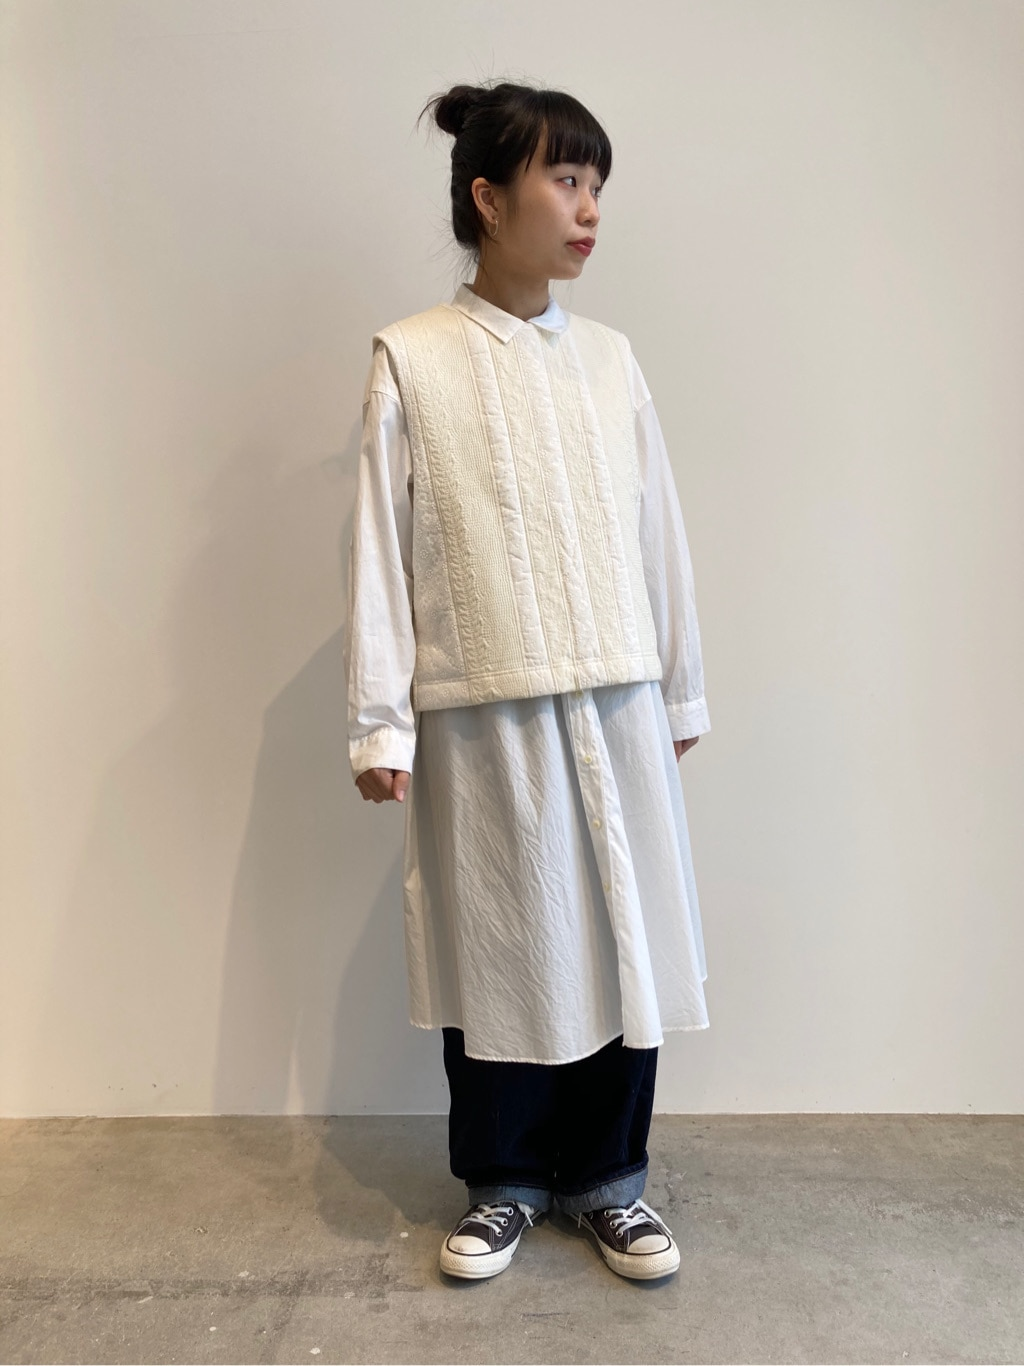 FLAT AMB 名古屋栄路面 2020.10.02